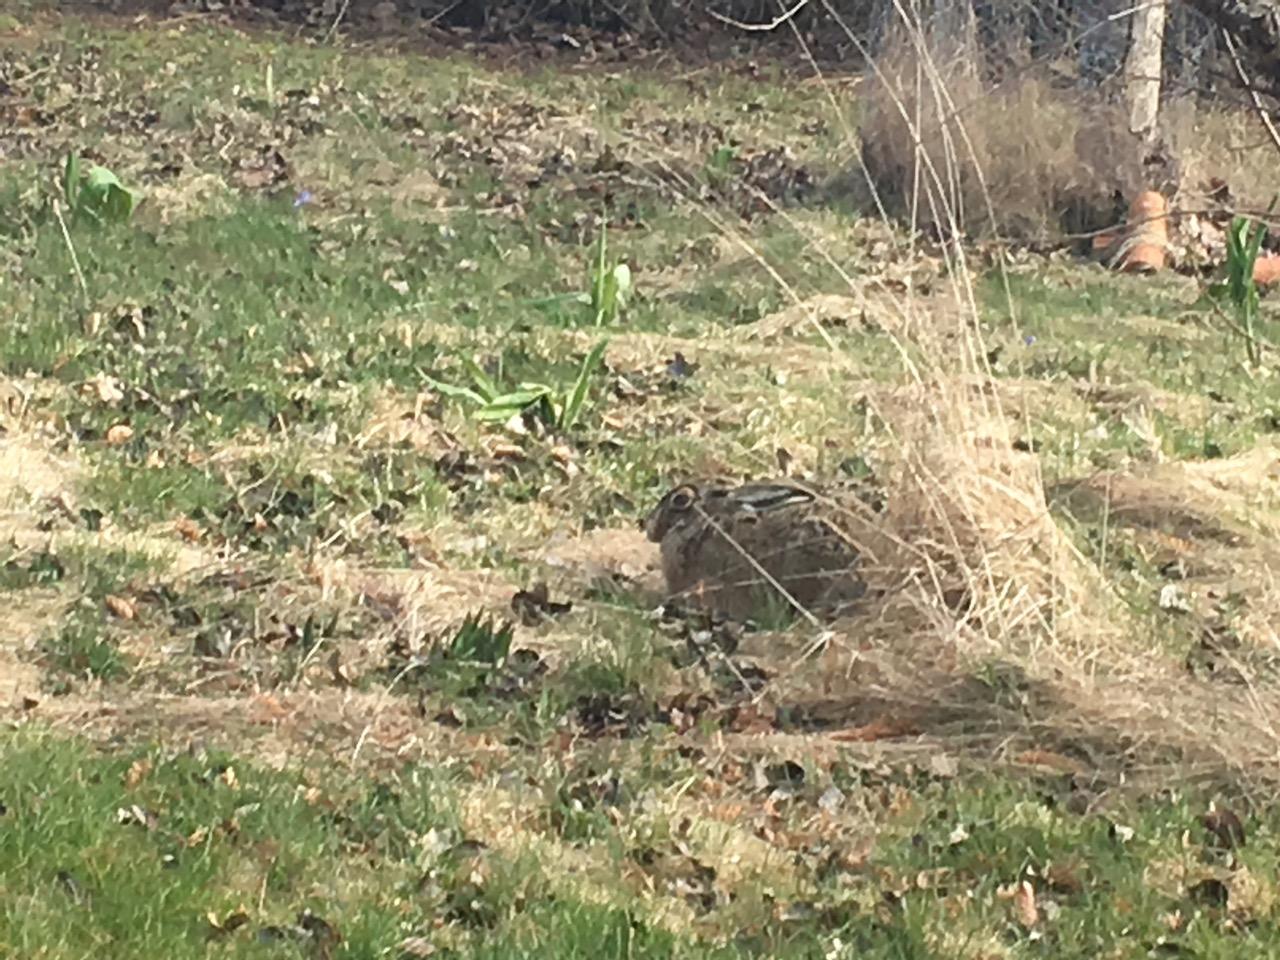 kurande hare